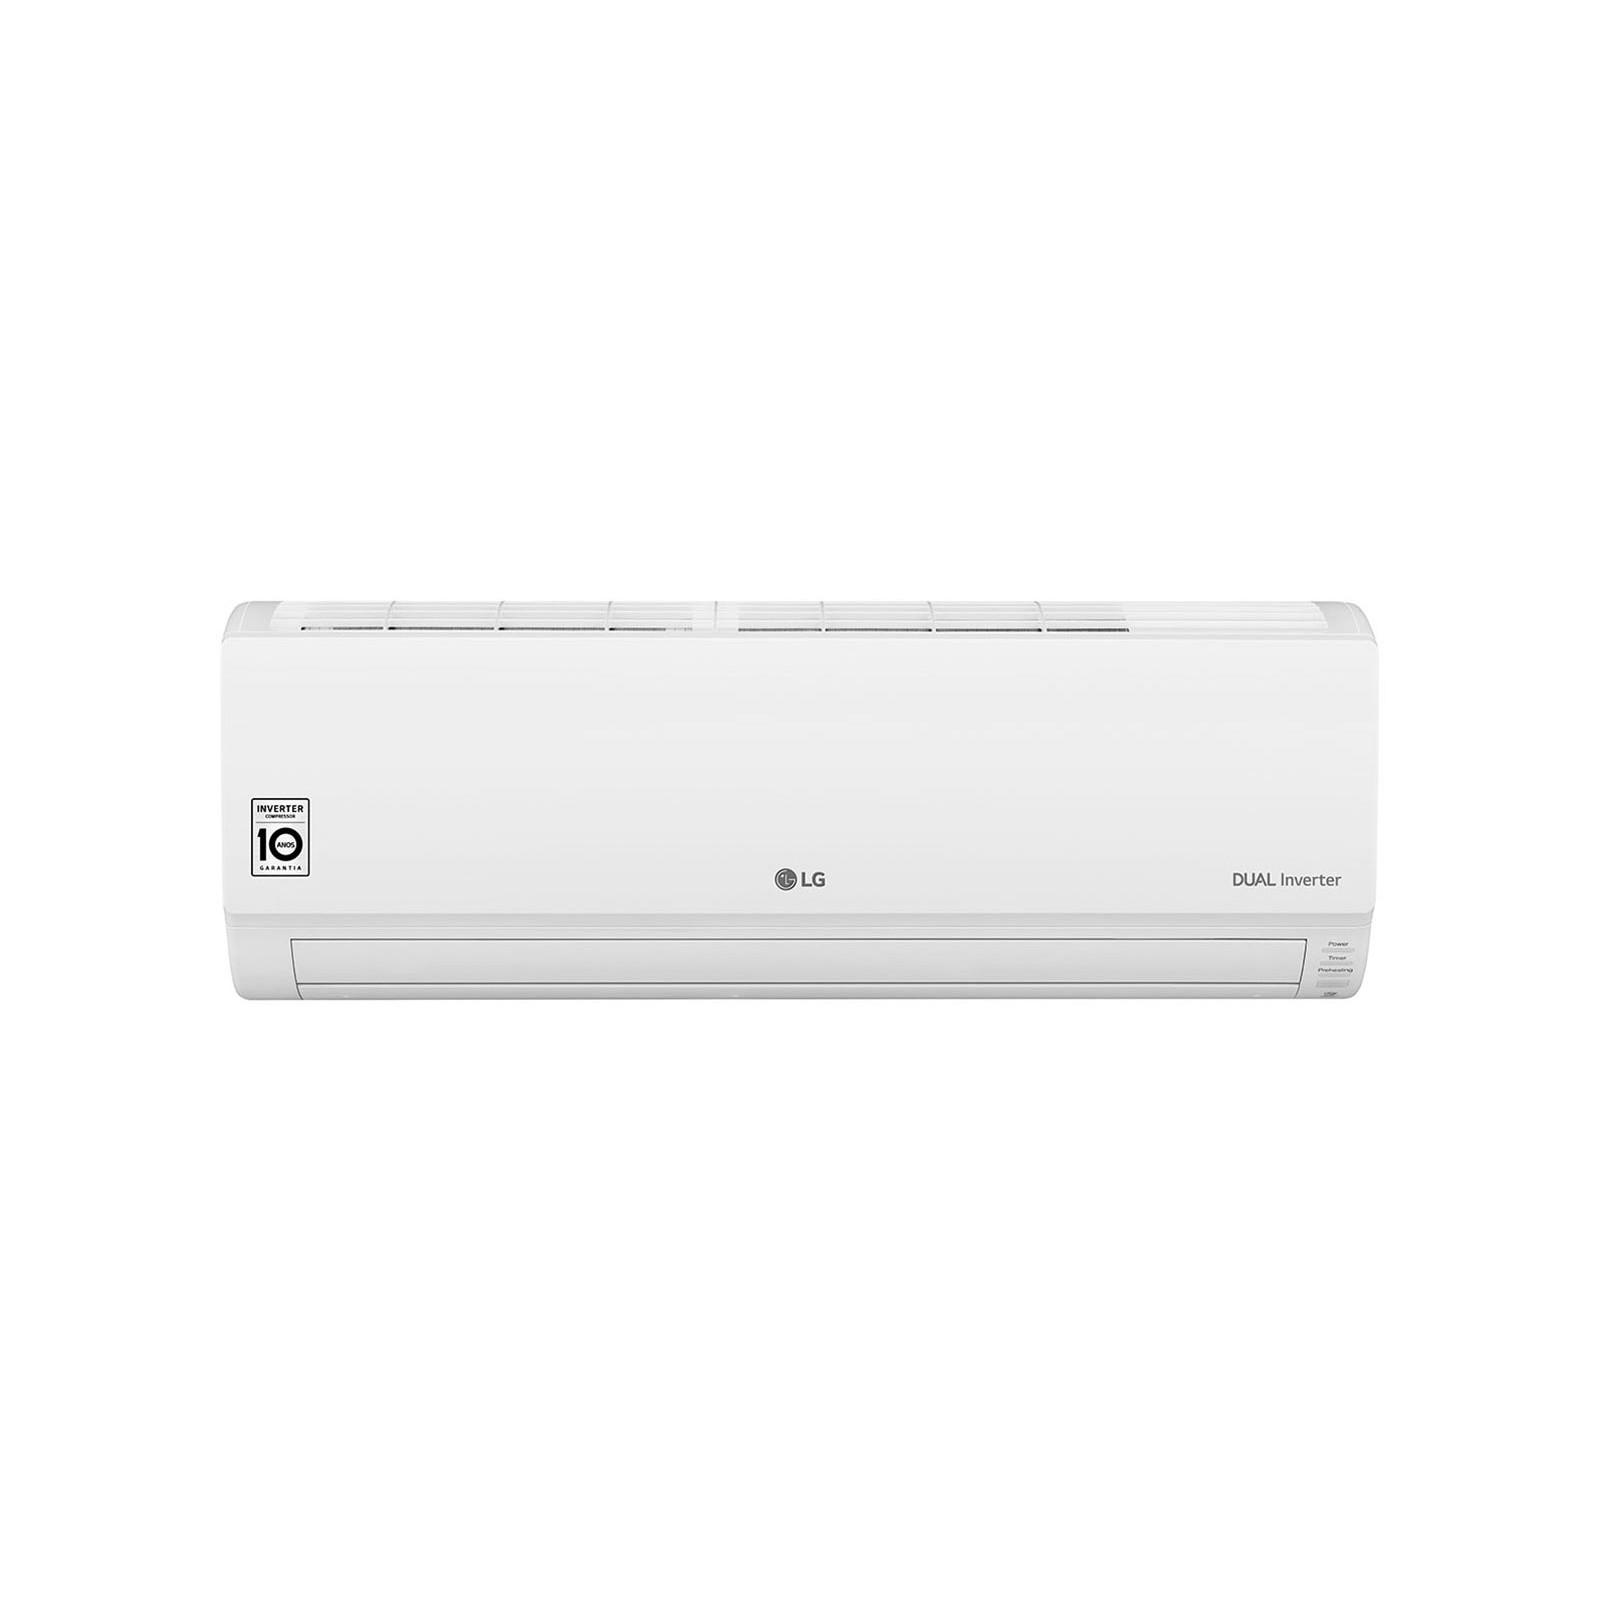 Ar Condicionado Multi split LG Inverter 9000 BTUs 220V - Frio - S4NQ09WA5AAEB2GAMZ